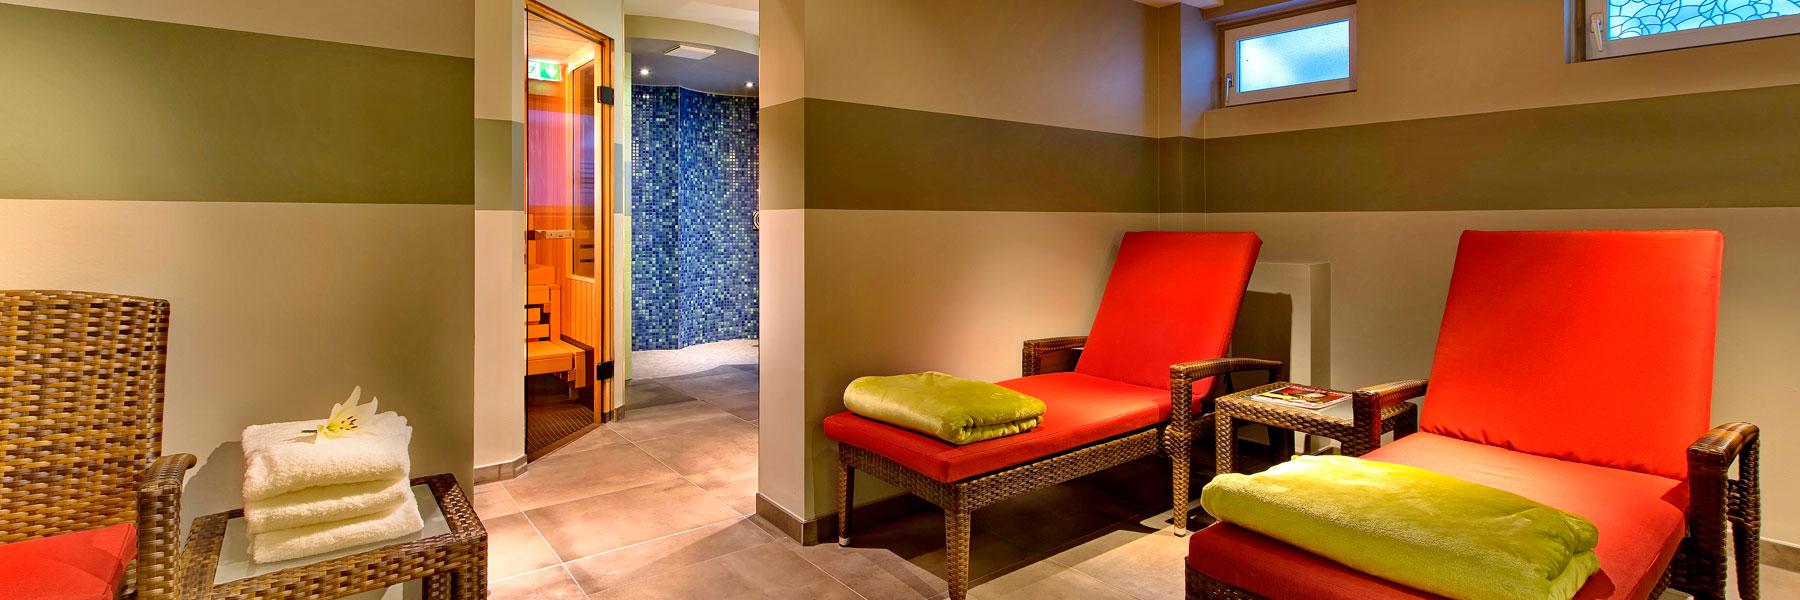 Wellness - Hotel Susewind